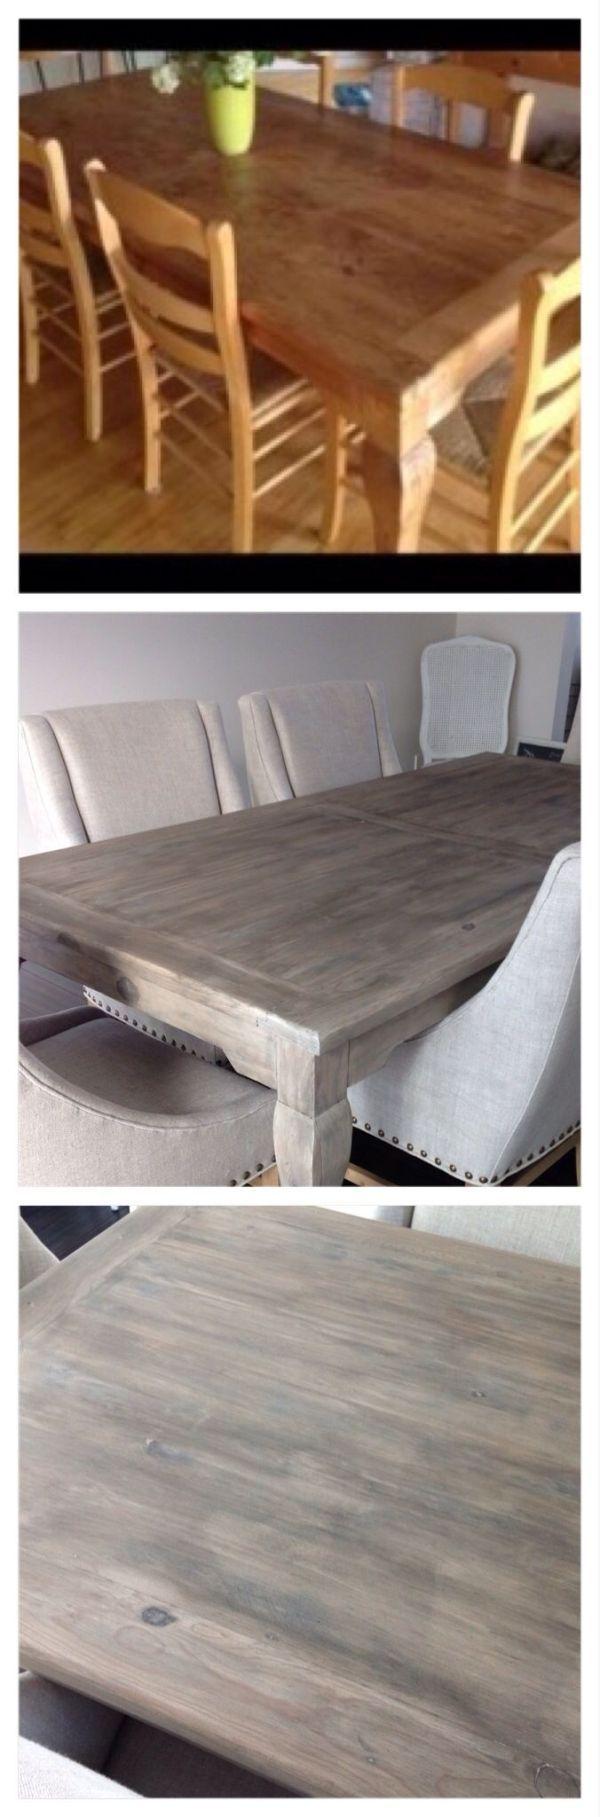 Diy Restoration Hardware Finishcraigslist Table Stripped Glamorous Dining Room Sets On Craigslist Inspiration